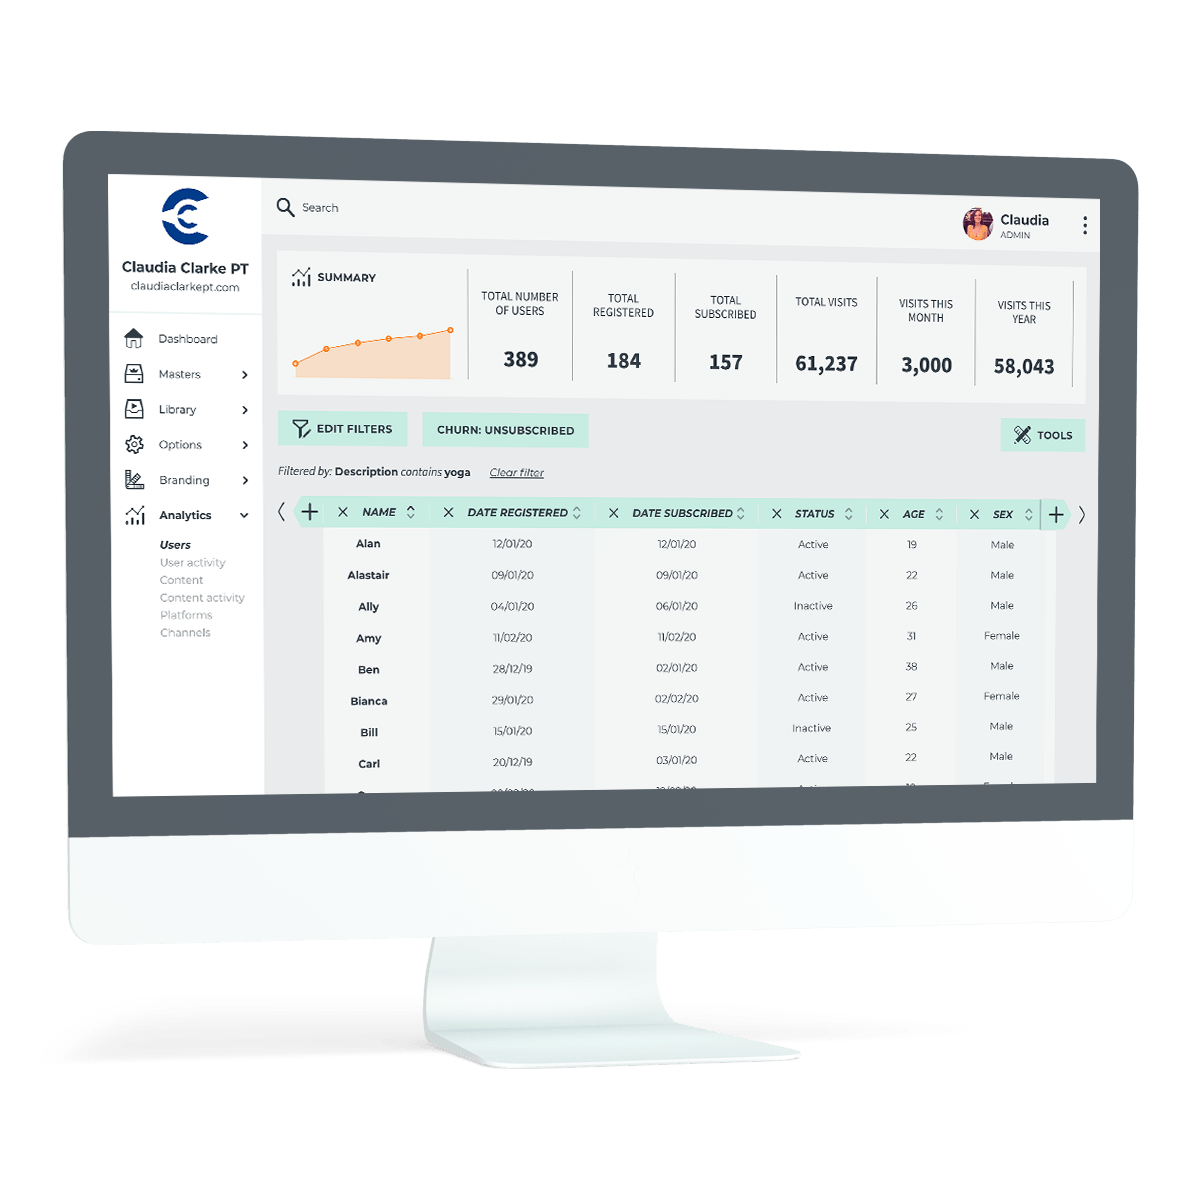 Claudia Clarke - Users Analytics